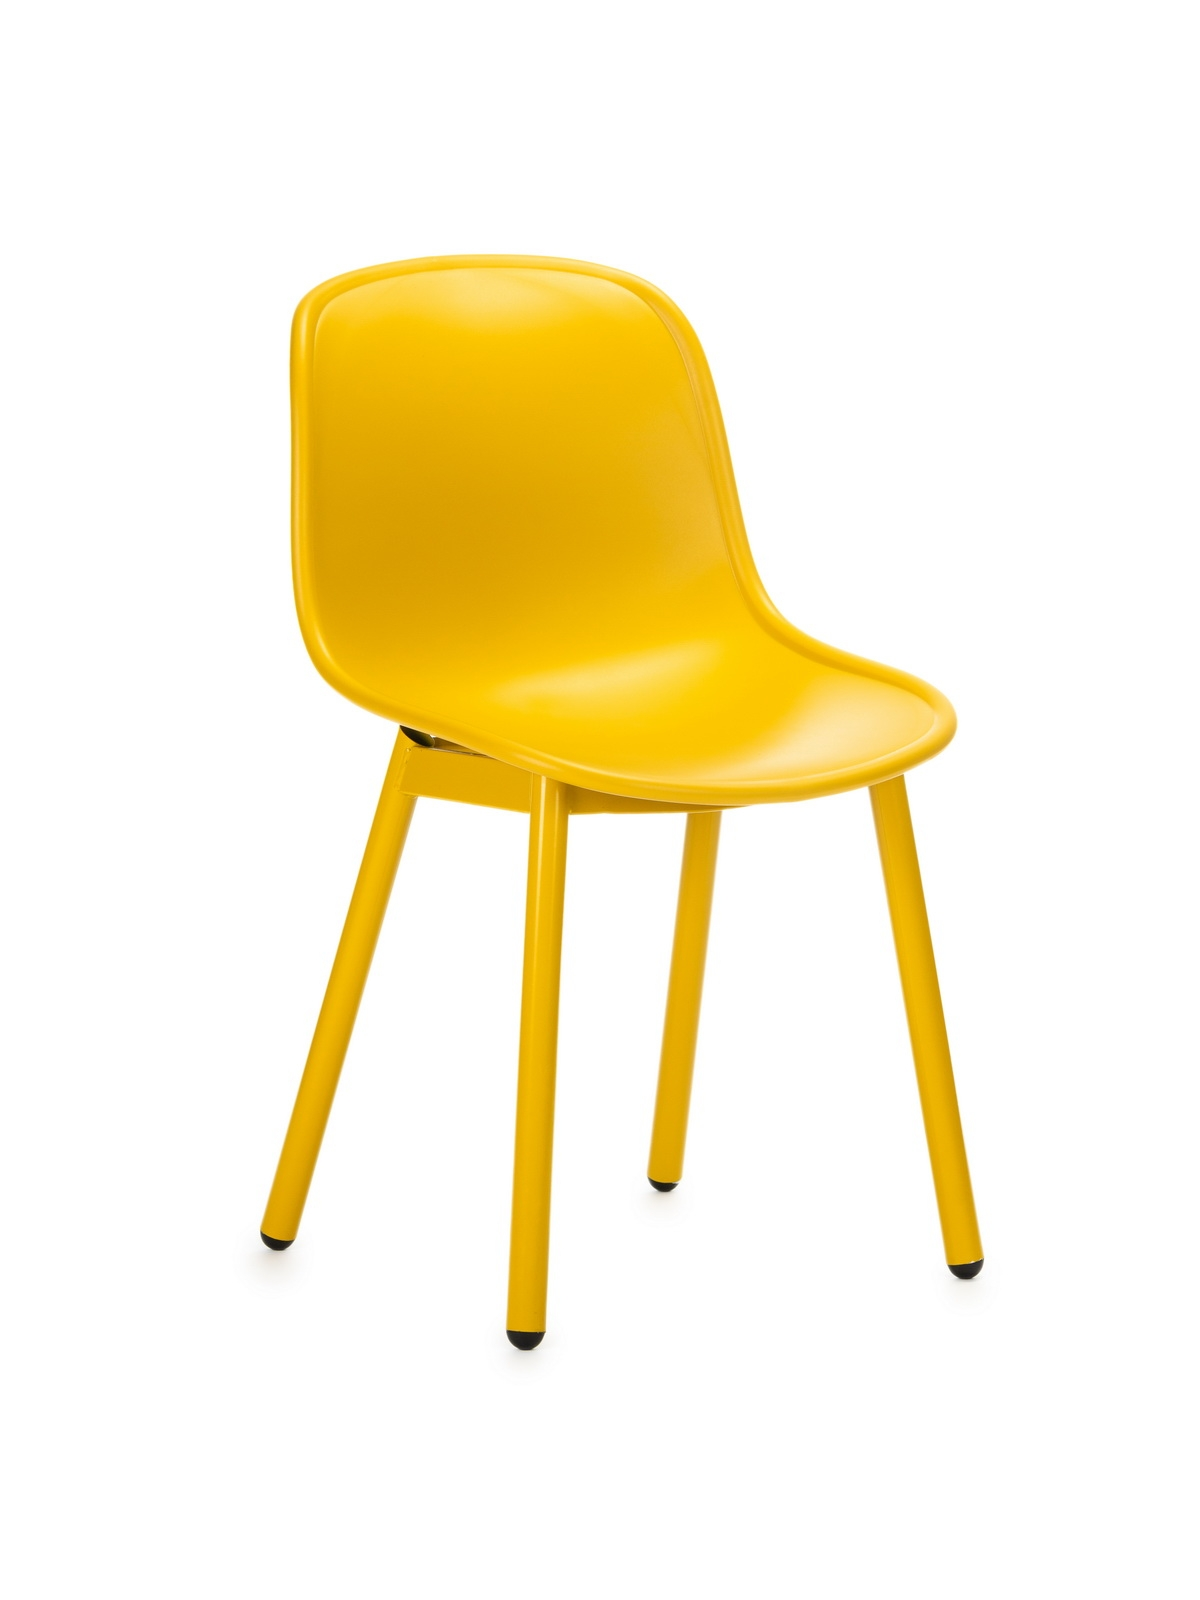 Scaun din plastic, cu picioare metalice Odyn Yellow, l57xA54xH78cm imagine